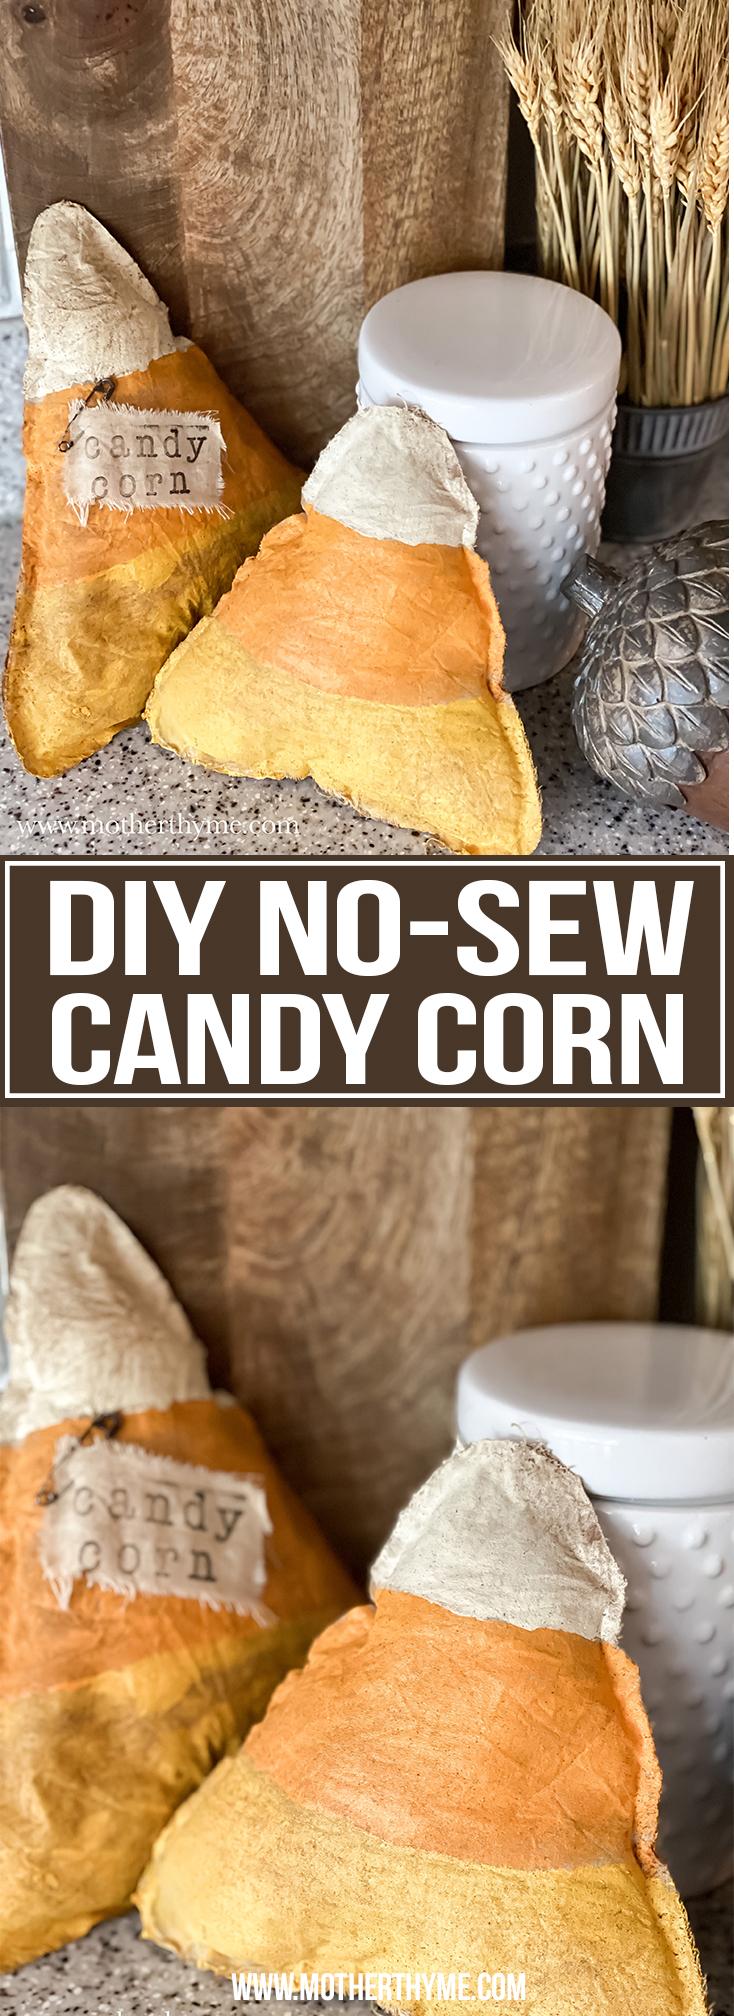 DIY NO-SEW RUSTIC FABRIC CANDY CORN